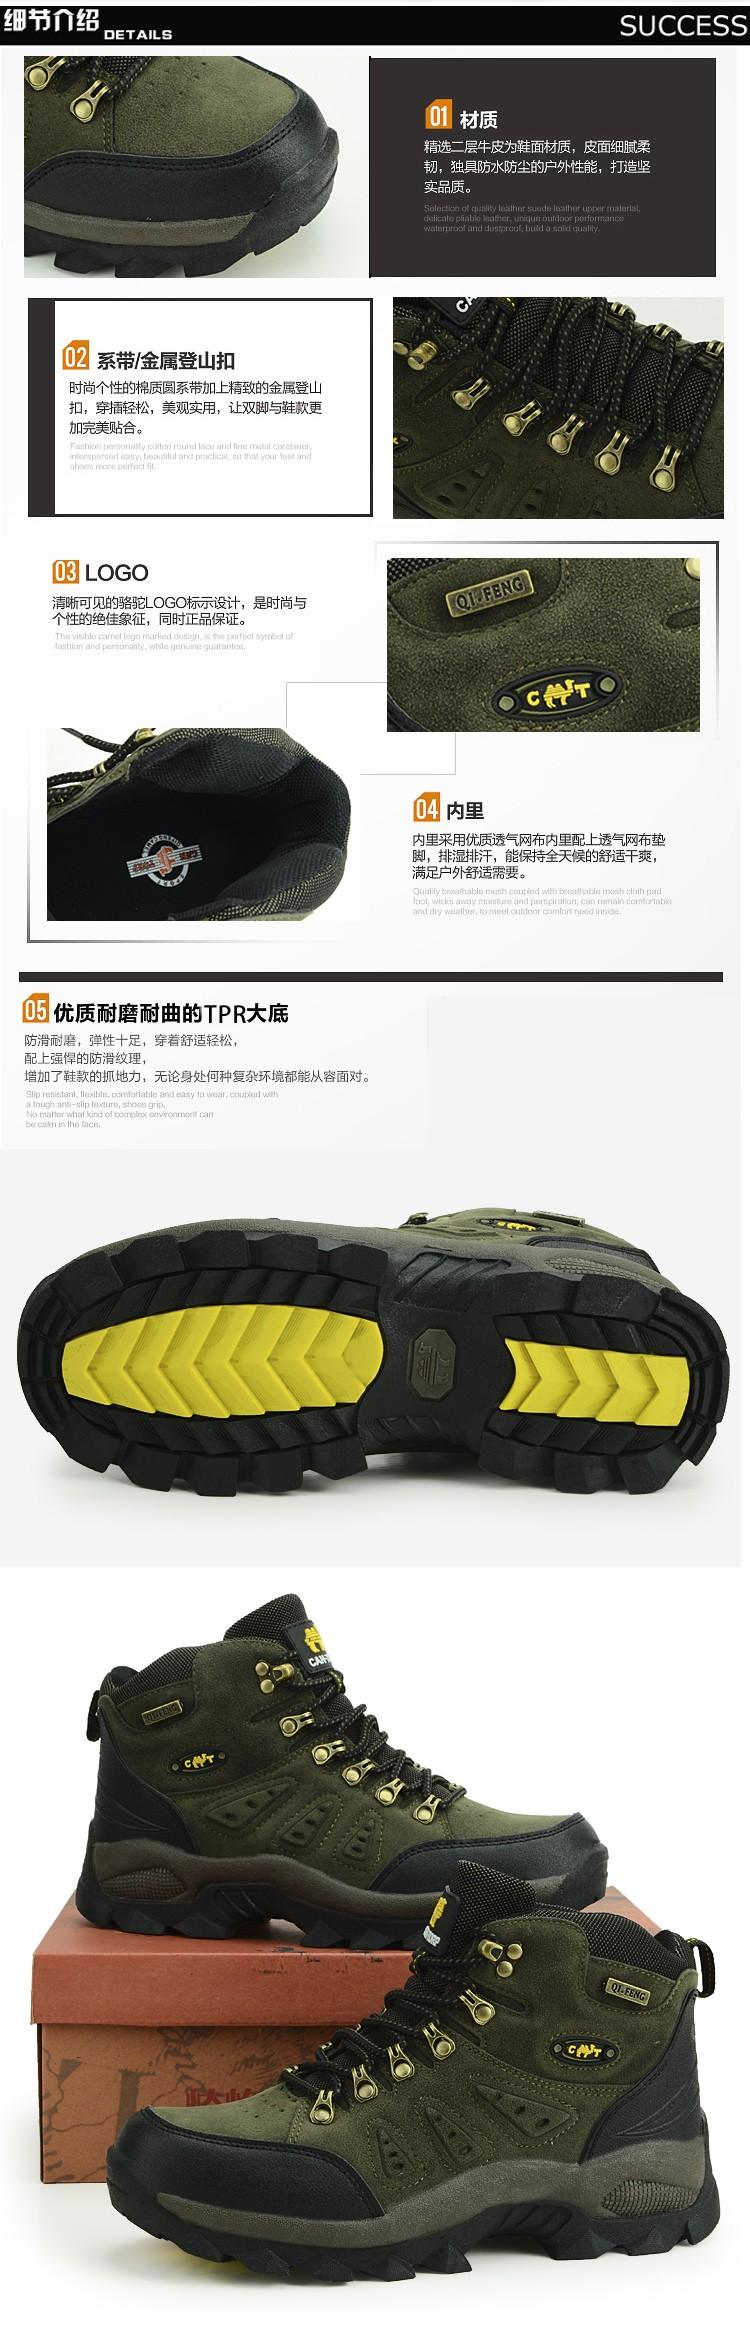 High Quality Brand Outdoor Boots Hiking Shoes New Autumn Winter Mens Sport Cool Trekking Mountain Climbing Suede Women Boots